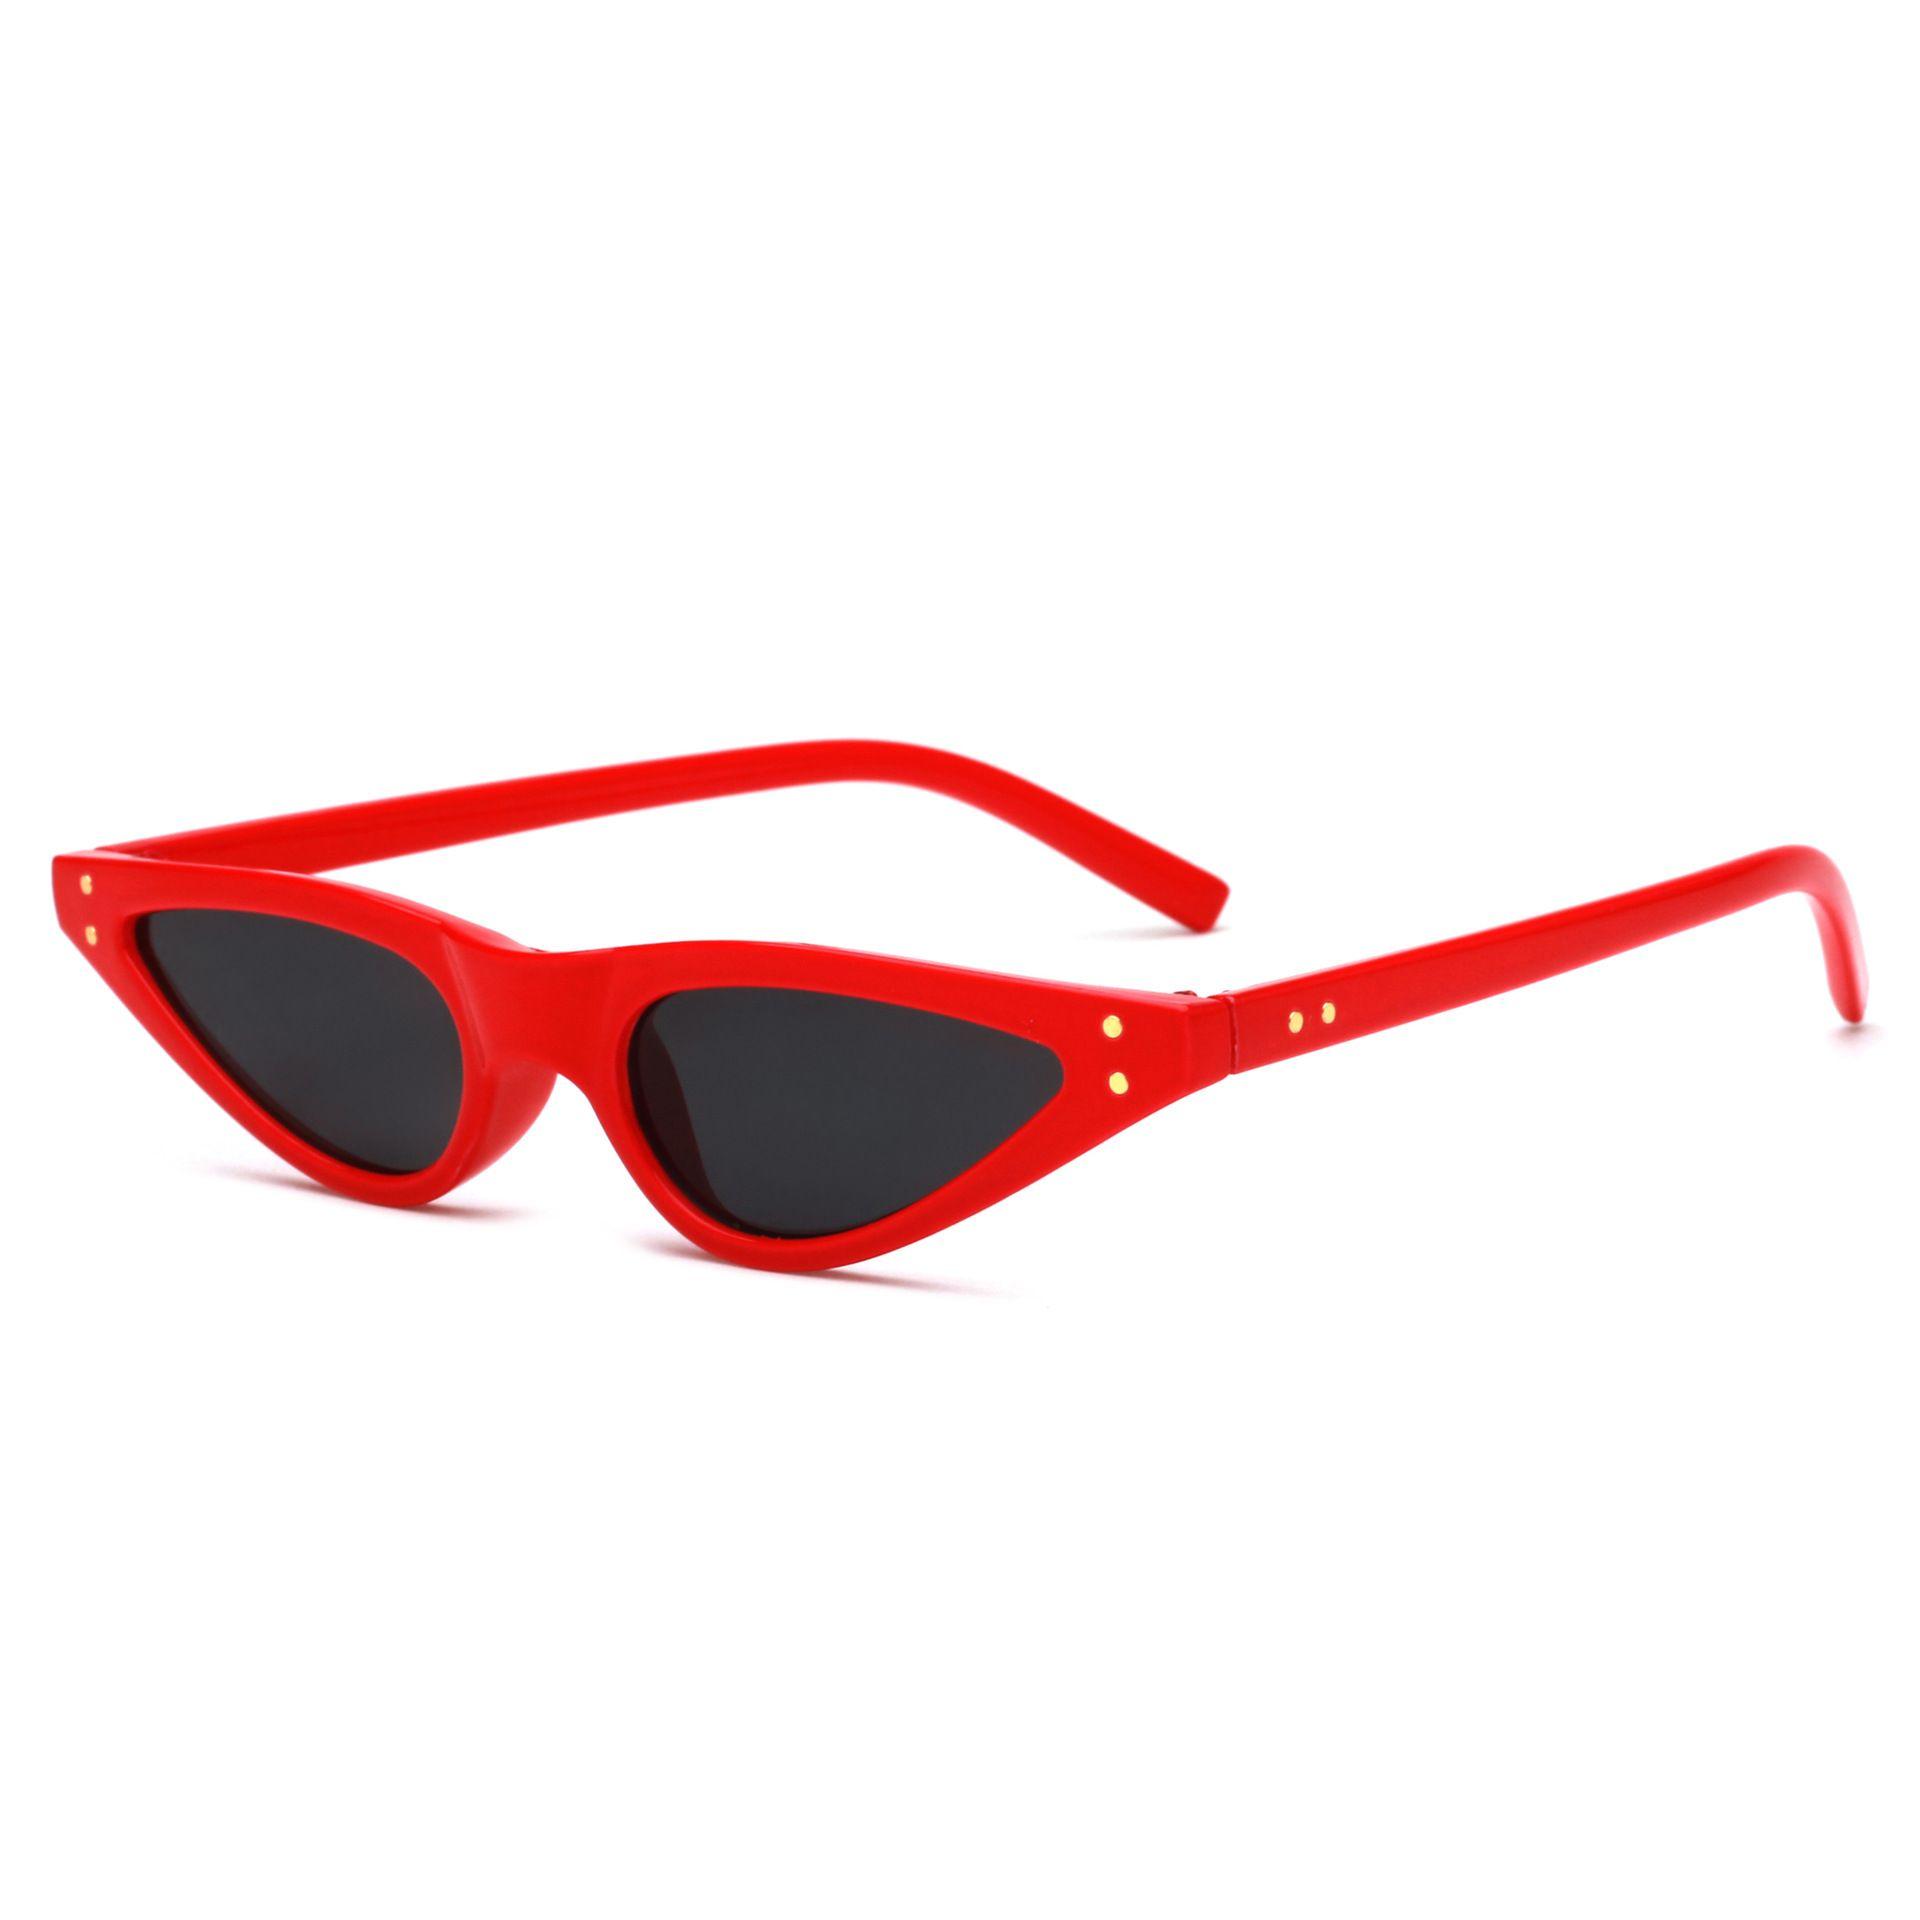 Low Price Wholesale Retro Glasses New Style UV Protection Sunglasses Women  Tiny Cat Eye Women Sunglasses Baby Sunglasses Designer Eyeglasses From  Mani13 d86a4c292b